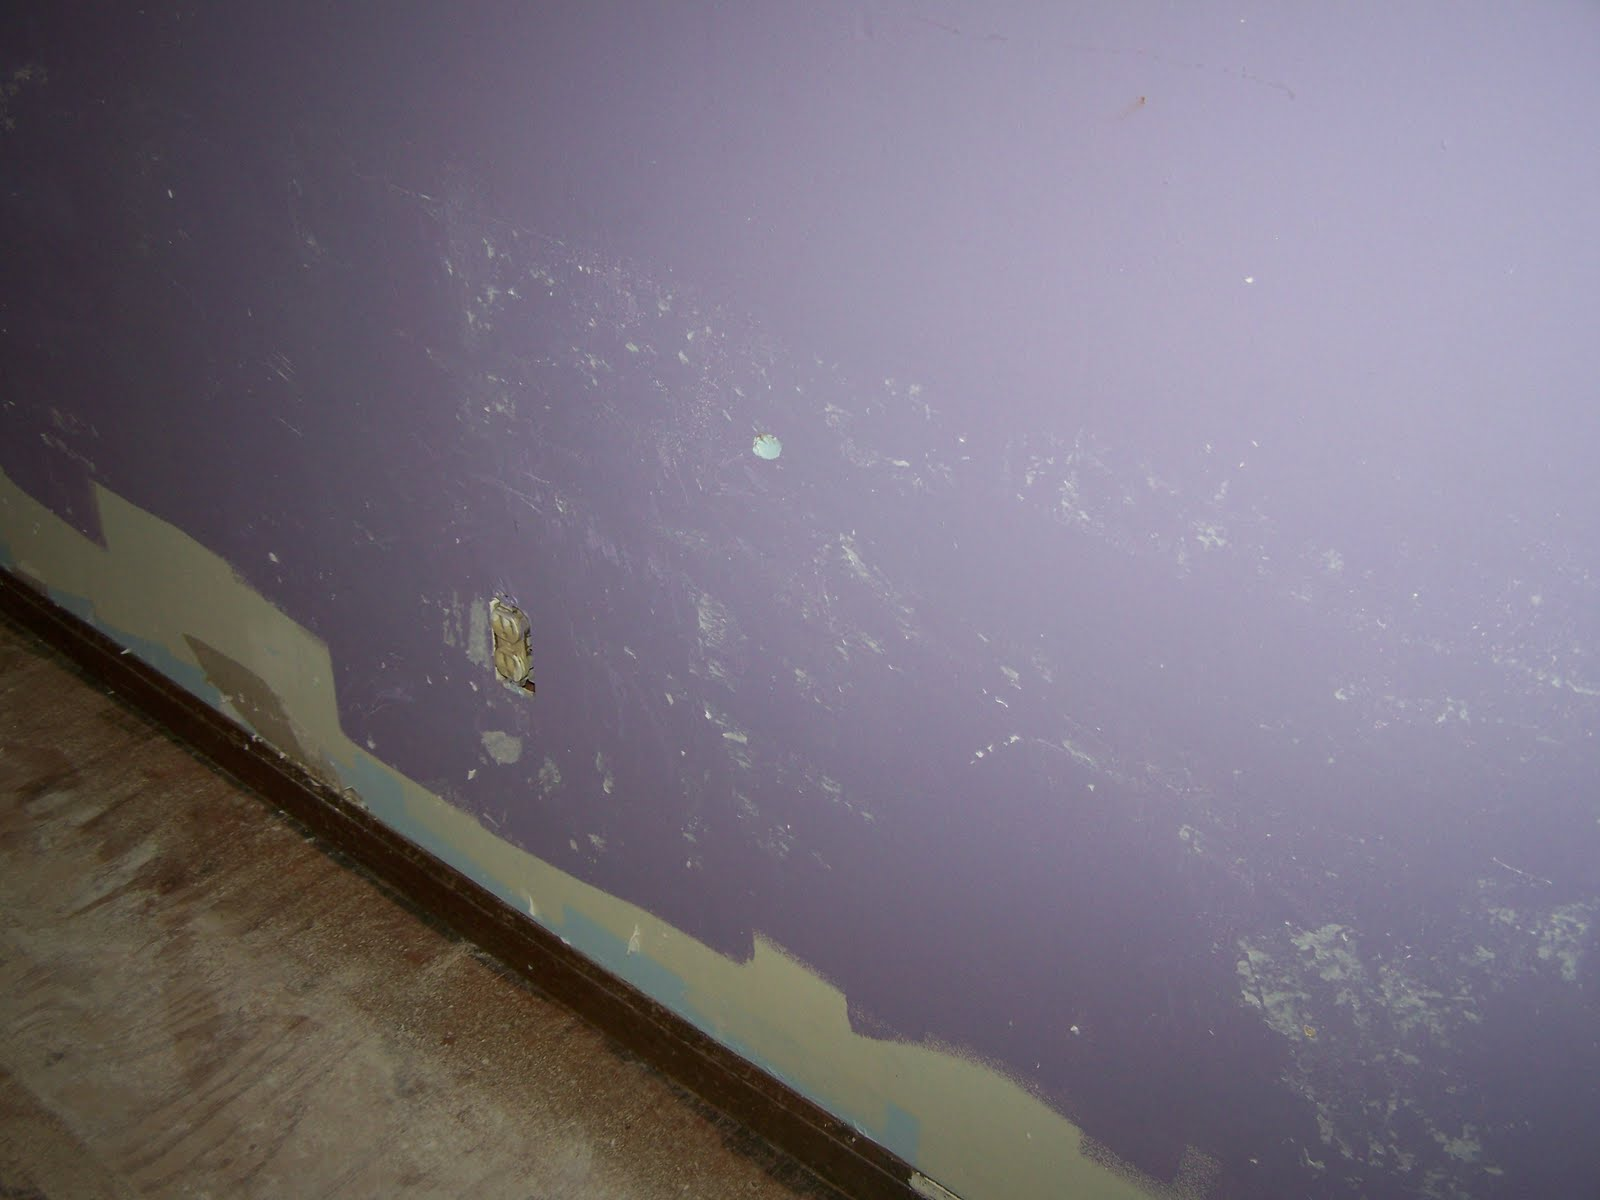 http://3.bp.blogspot.com/-Sdj1cF56qQU/TlJ2WWFpIOI/AAAAAAAAALA/1D0EULjguic/s1600/guest+room+wallpaper+removal+2.jpg